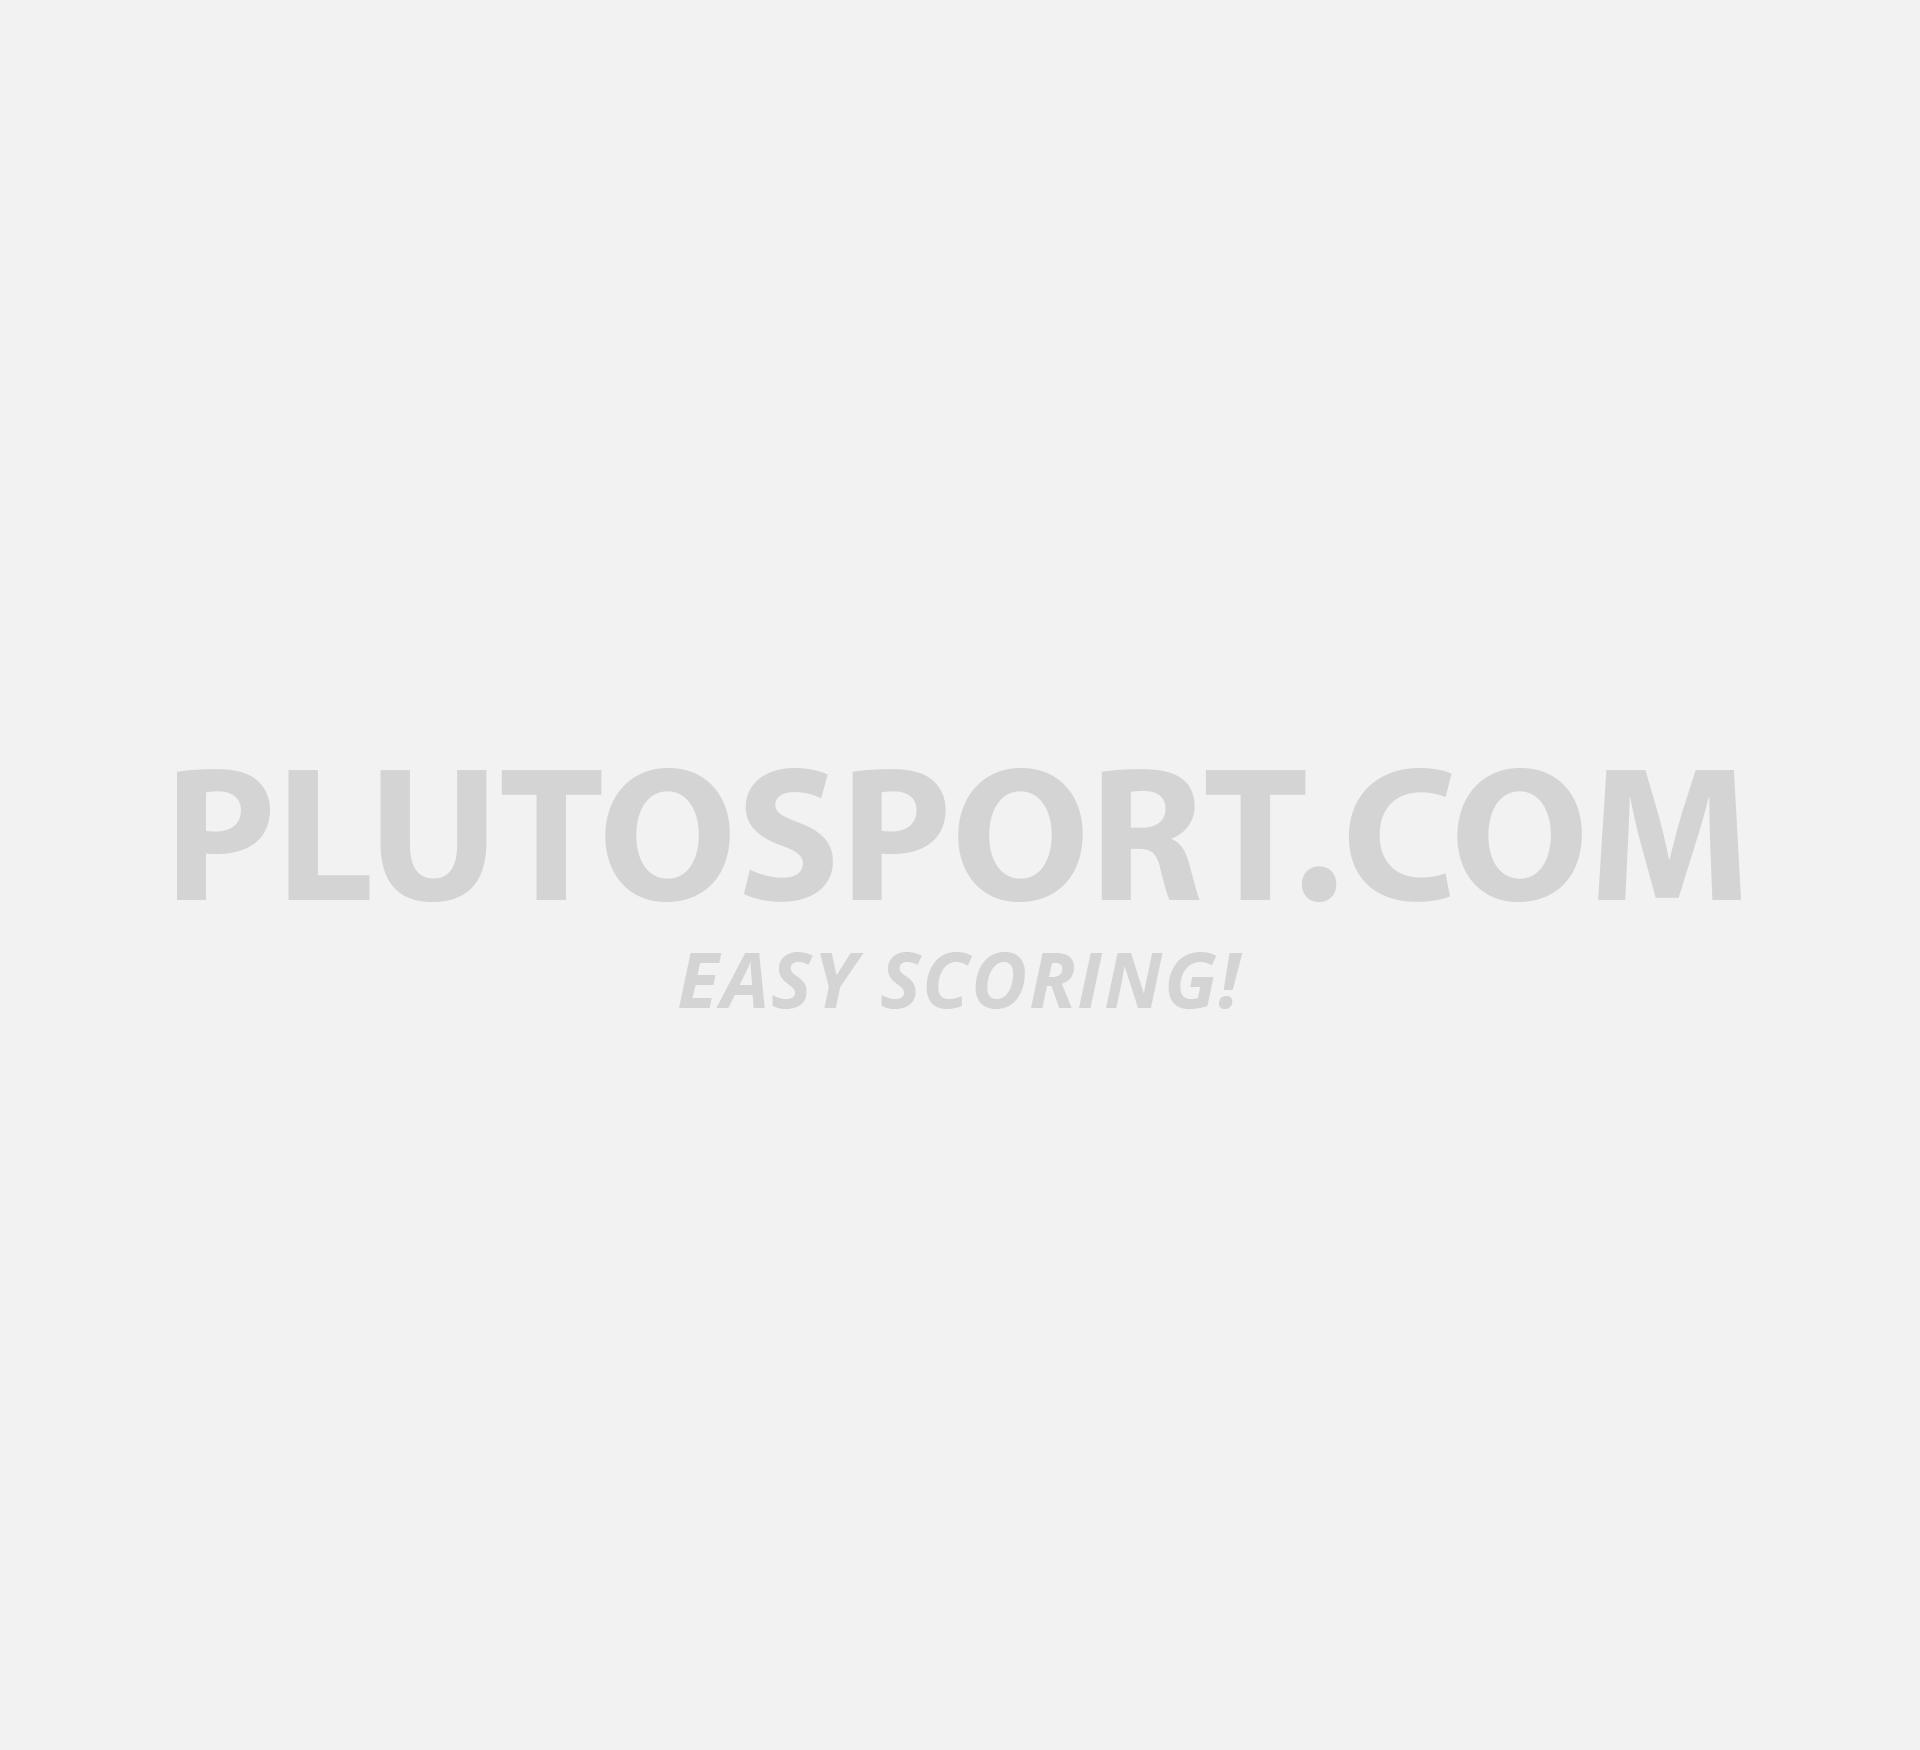 best loved 61da3 fa96c Adidas Duramo 6 Runningshoe Womens - Neutral - Shoes - Running - Sports   Plutosport